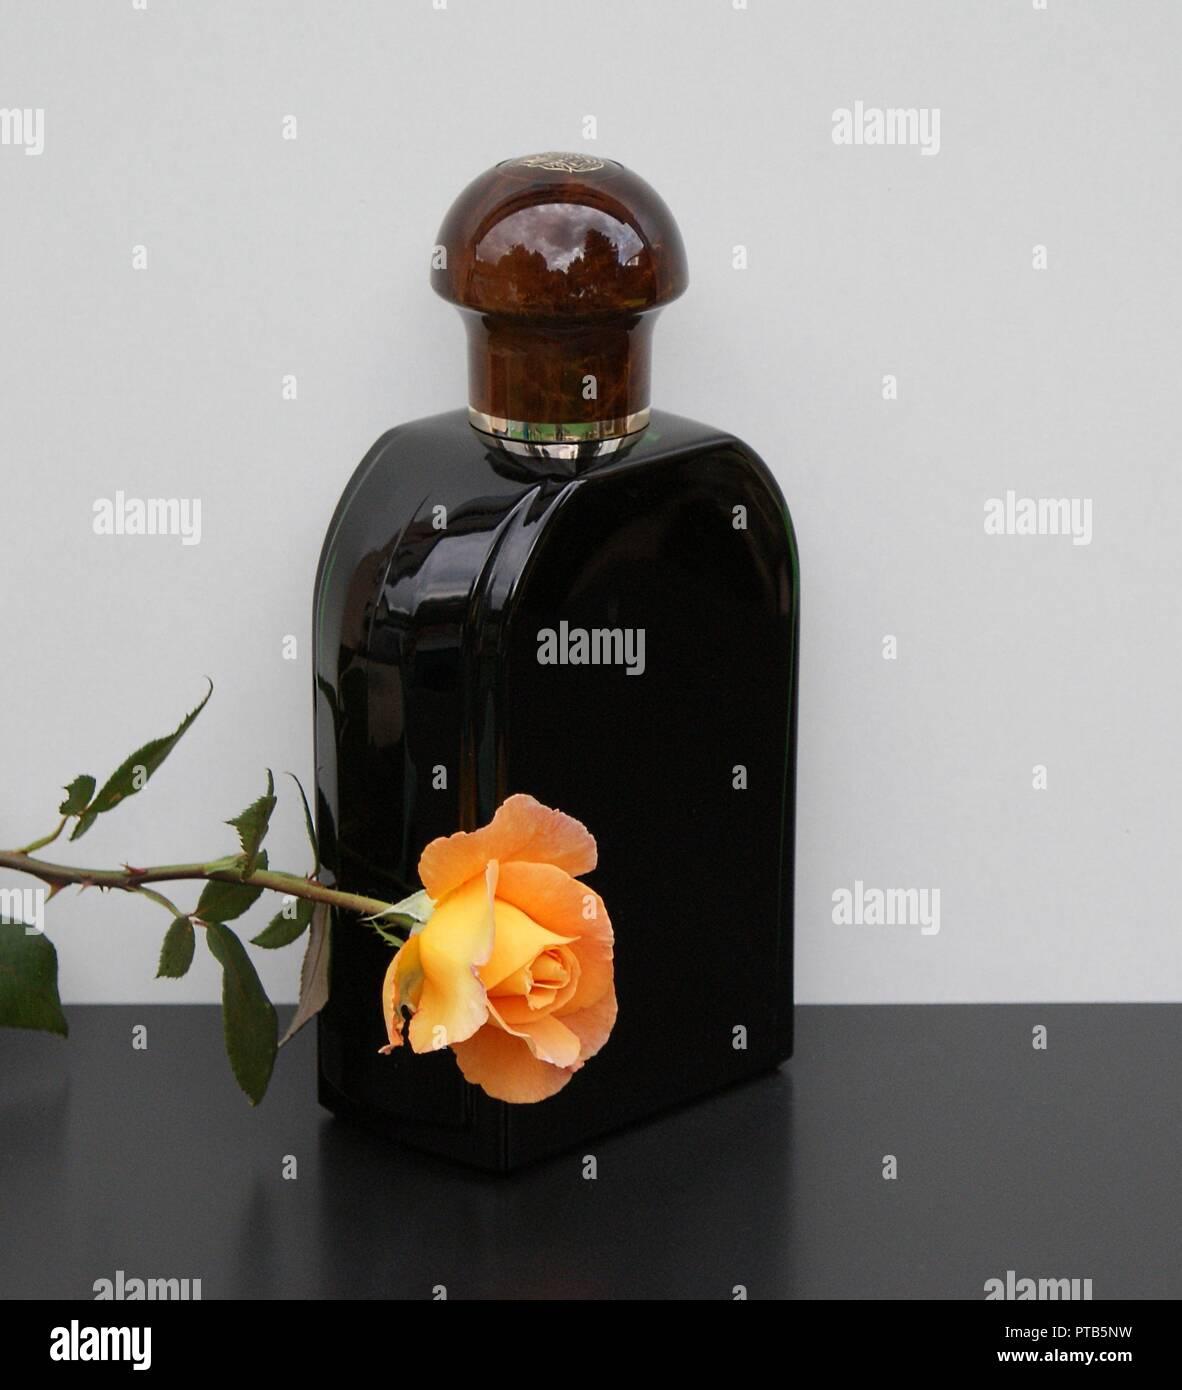 Jaguar Perfume Made In France: Eau De Perfume Stock Photos & Eau De Perfume Stock Images